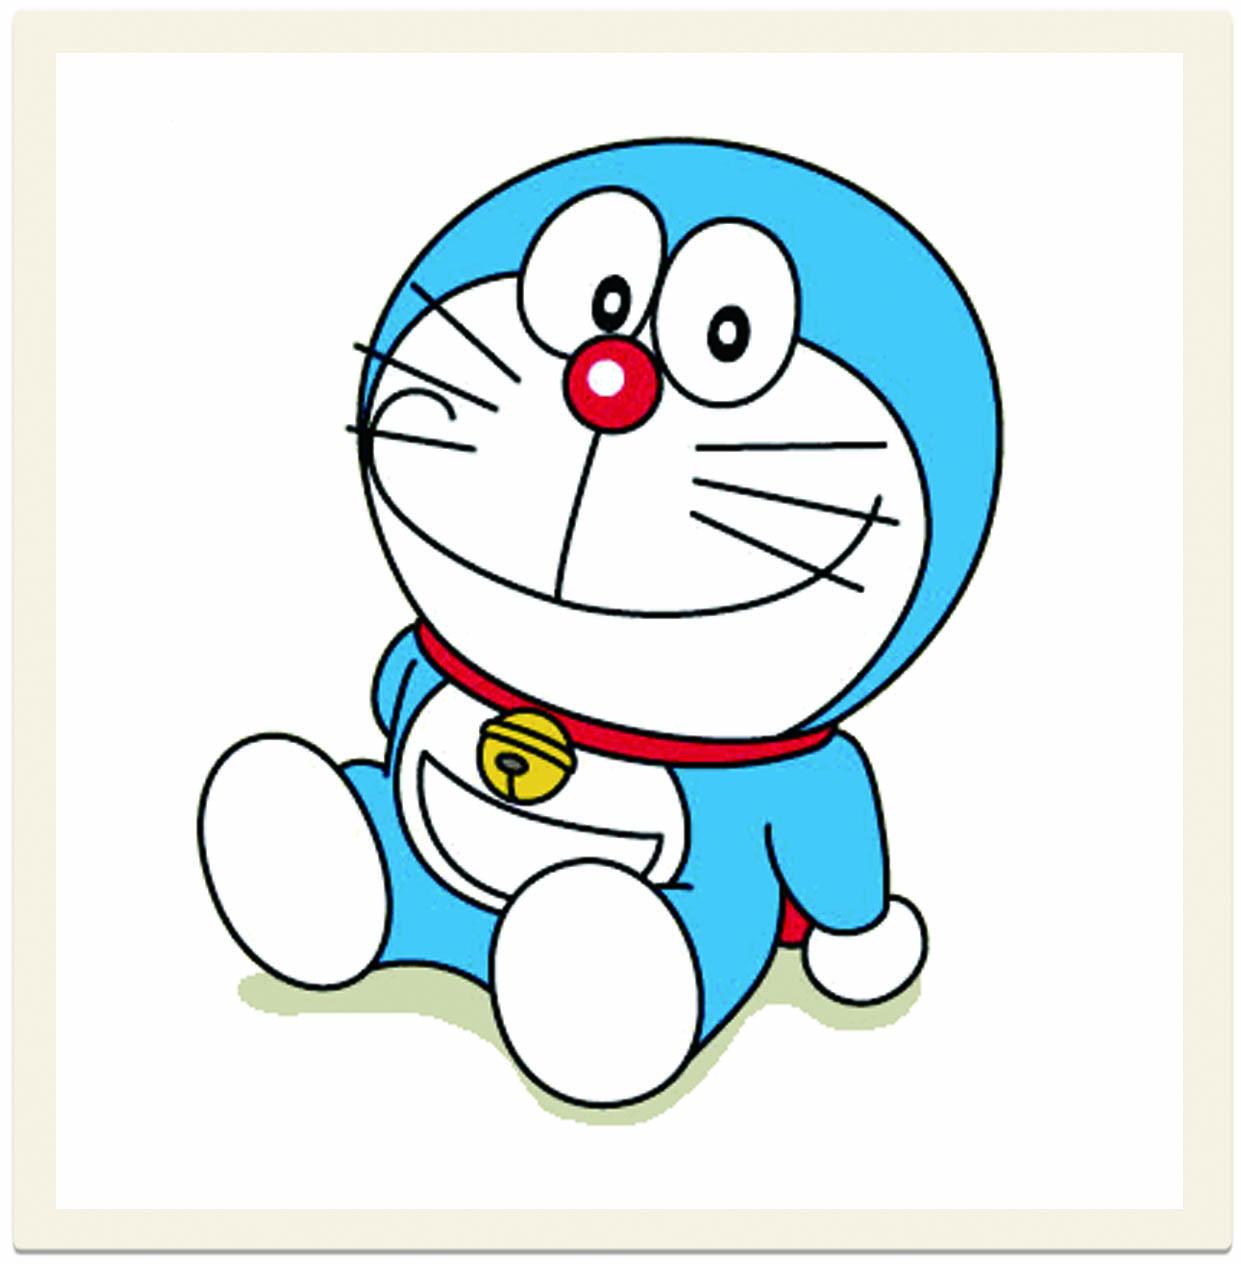 Ekspo 100 Peranti Rahsia Doraemon